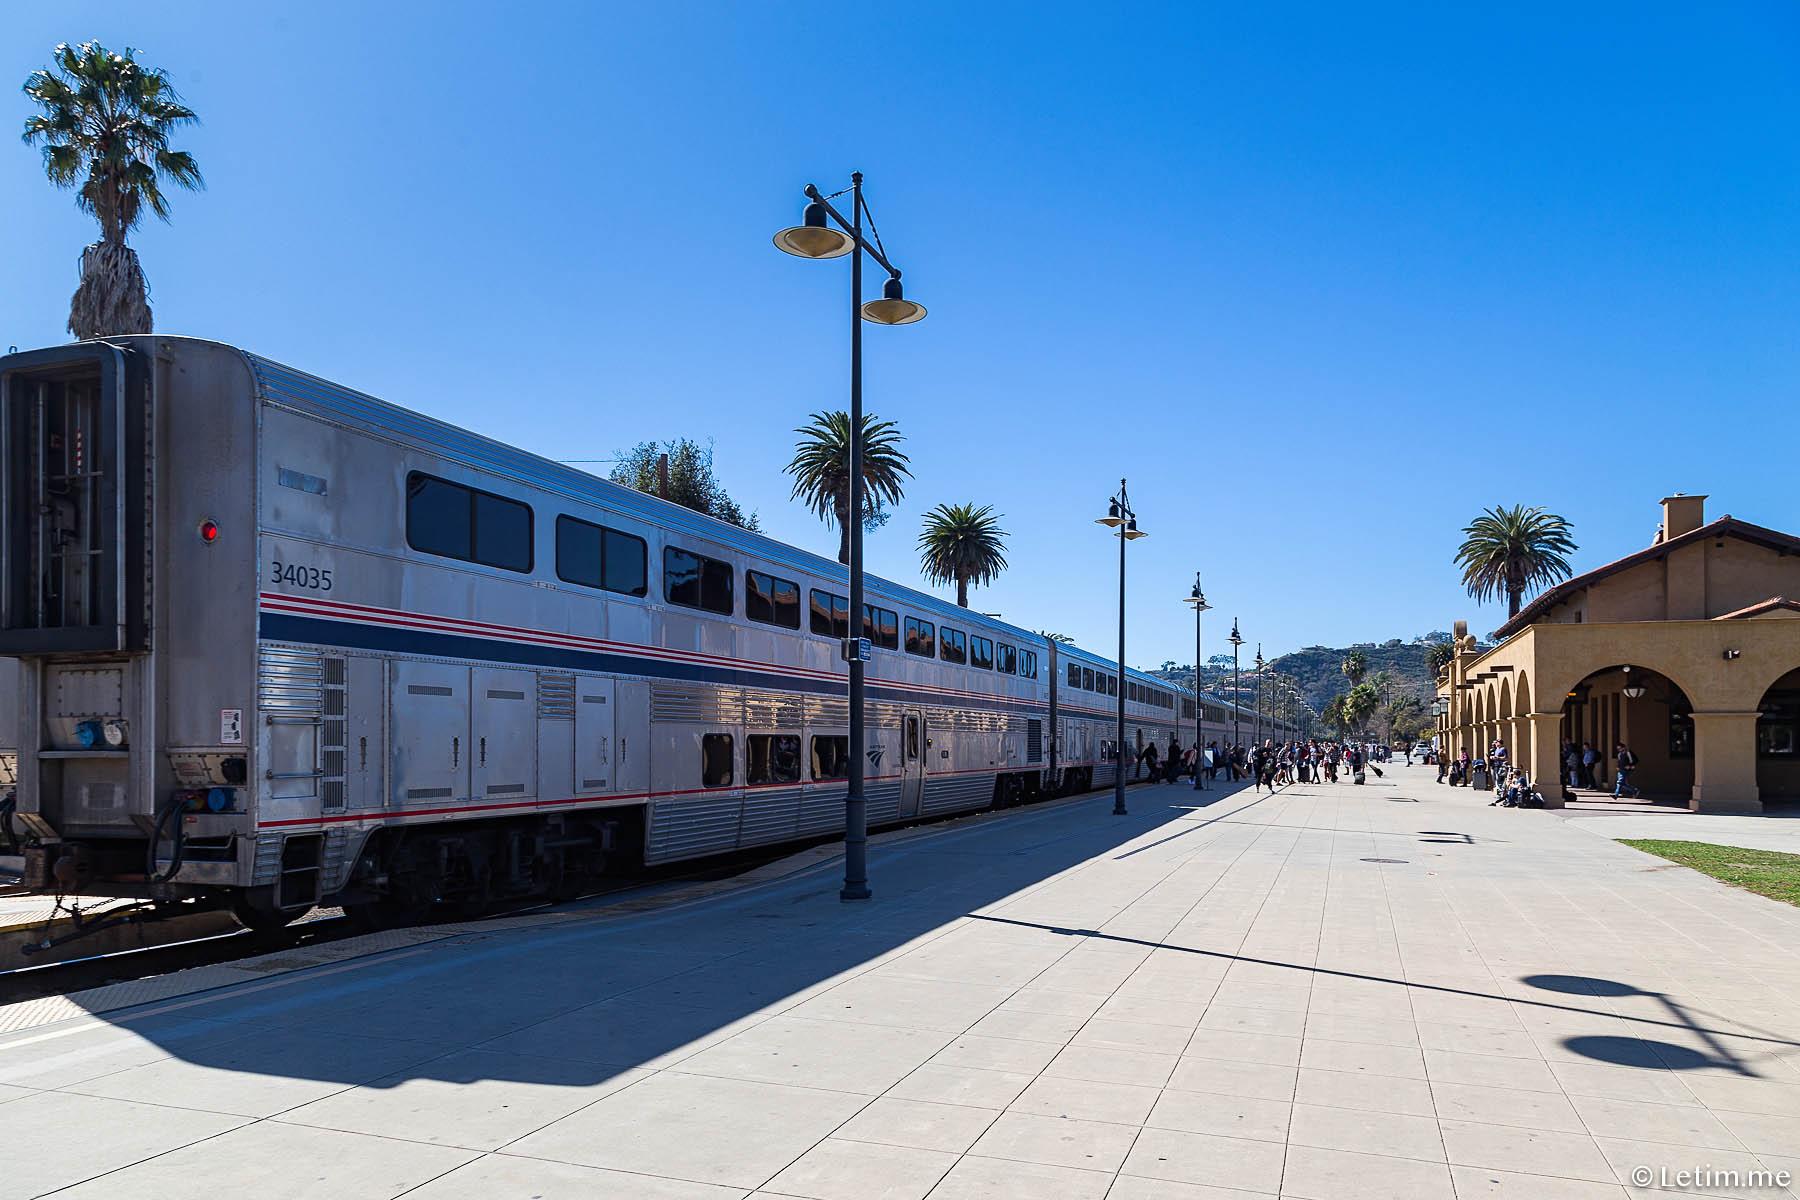 Состав Лос-Анджелес - Сан-Франциско на станции вокзала в г. Санта-Барбара